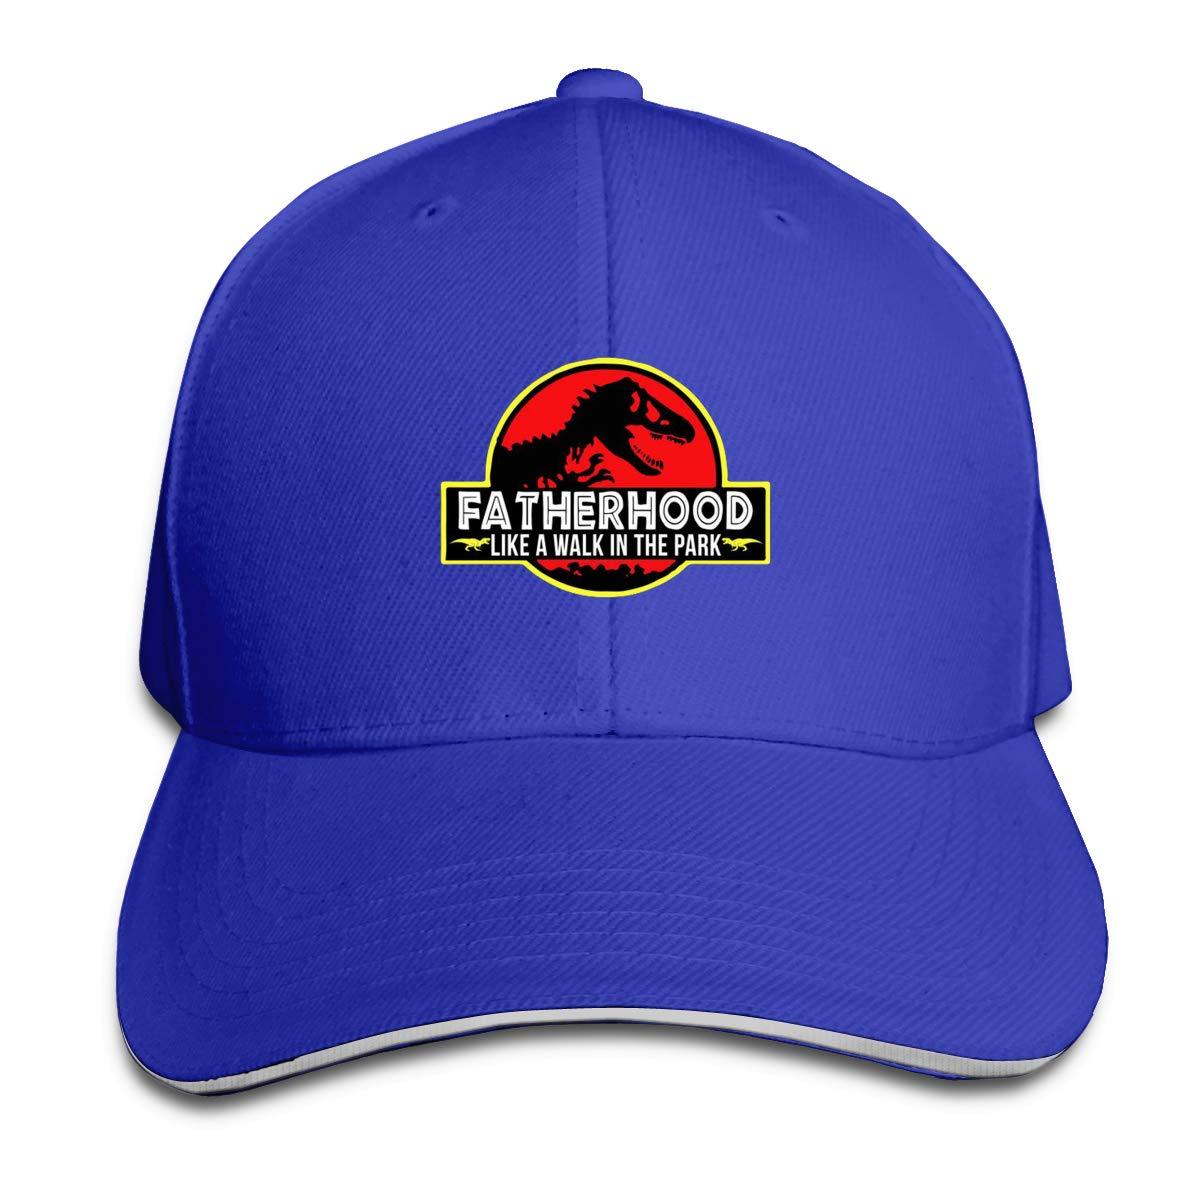 Fatherhood Like A Walk in The Park Unisex Twill Adjustable Sports Hat